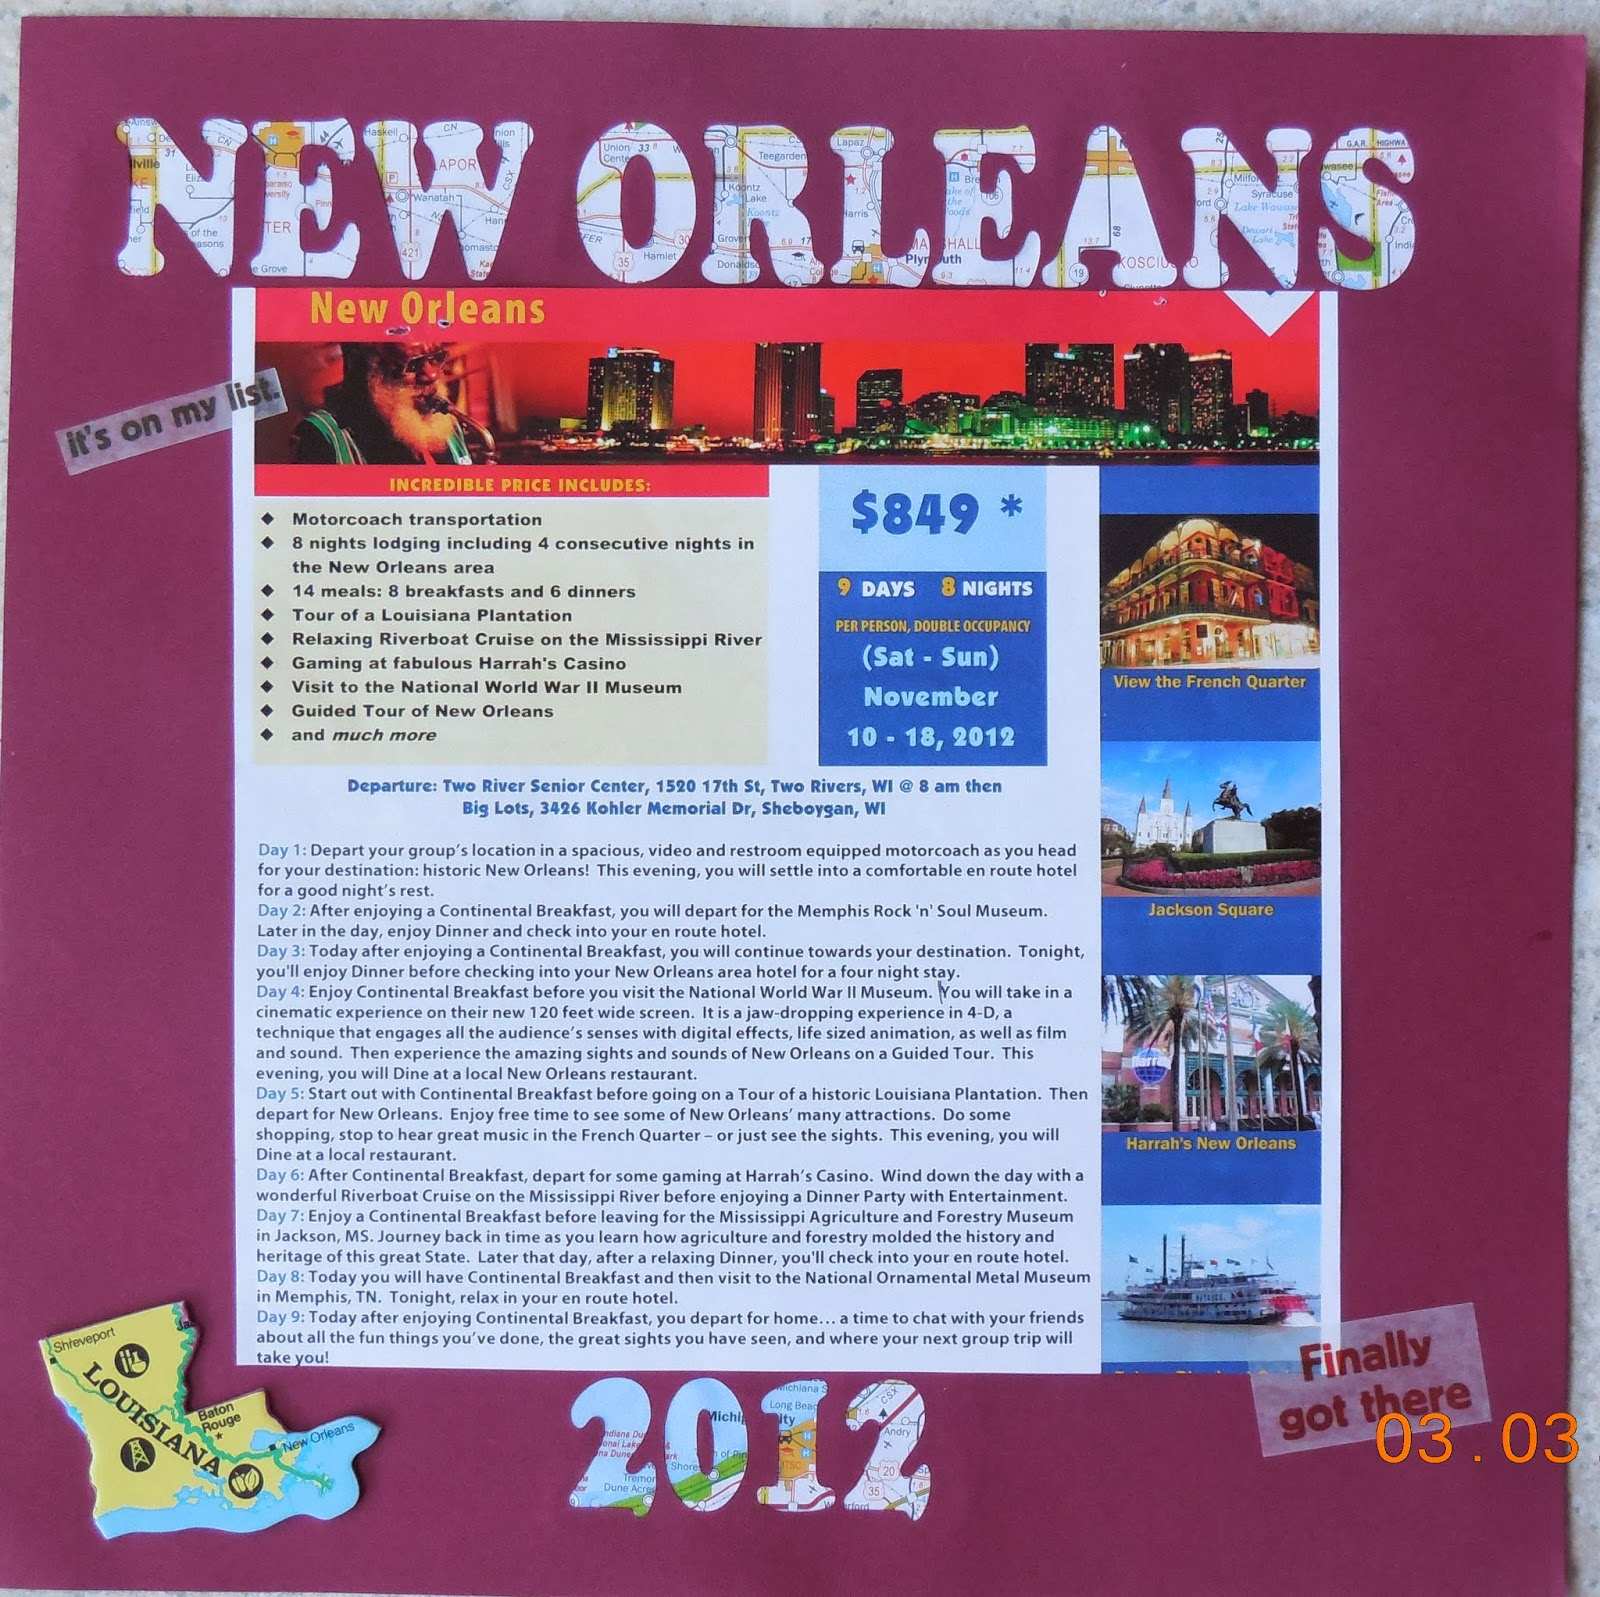 Scrapbook ideas new orleans - Scrapbook Ideas New Orleans The New Orleans And Year Were Cut With My Silhouette I M